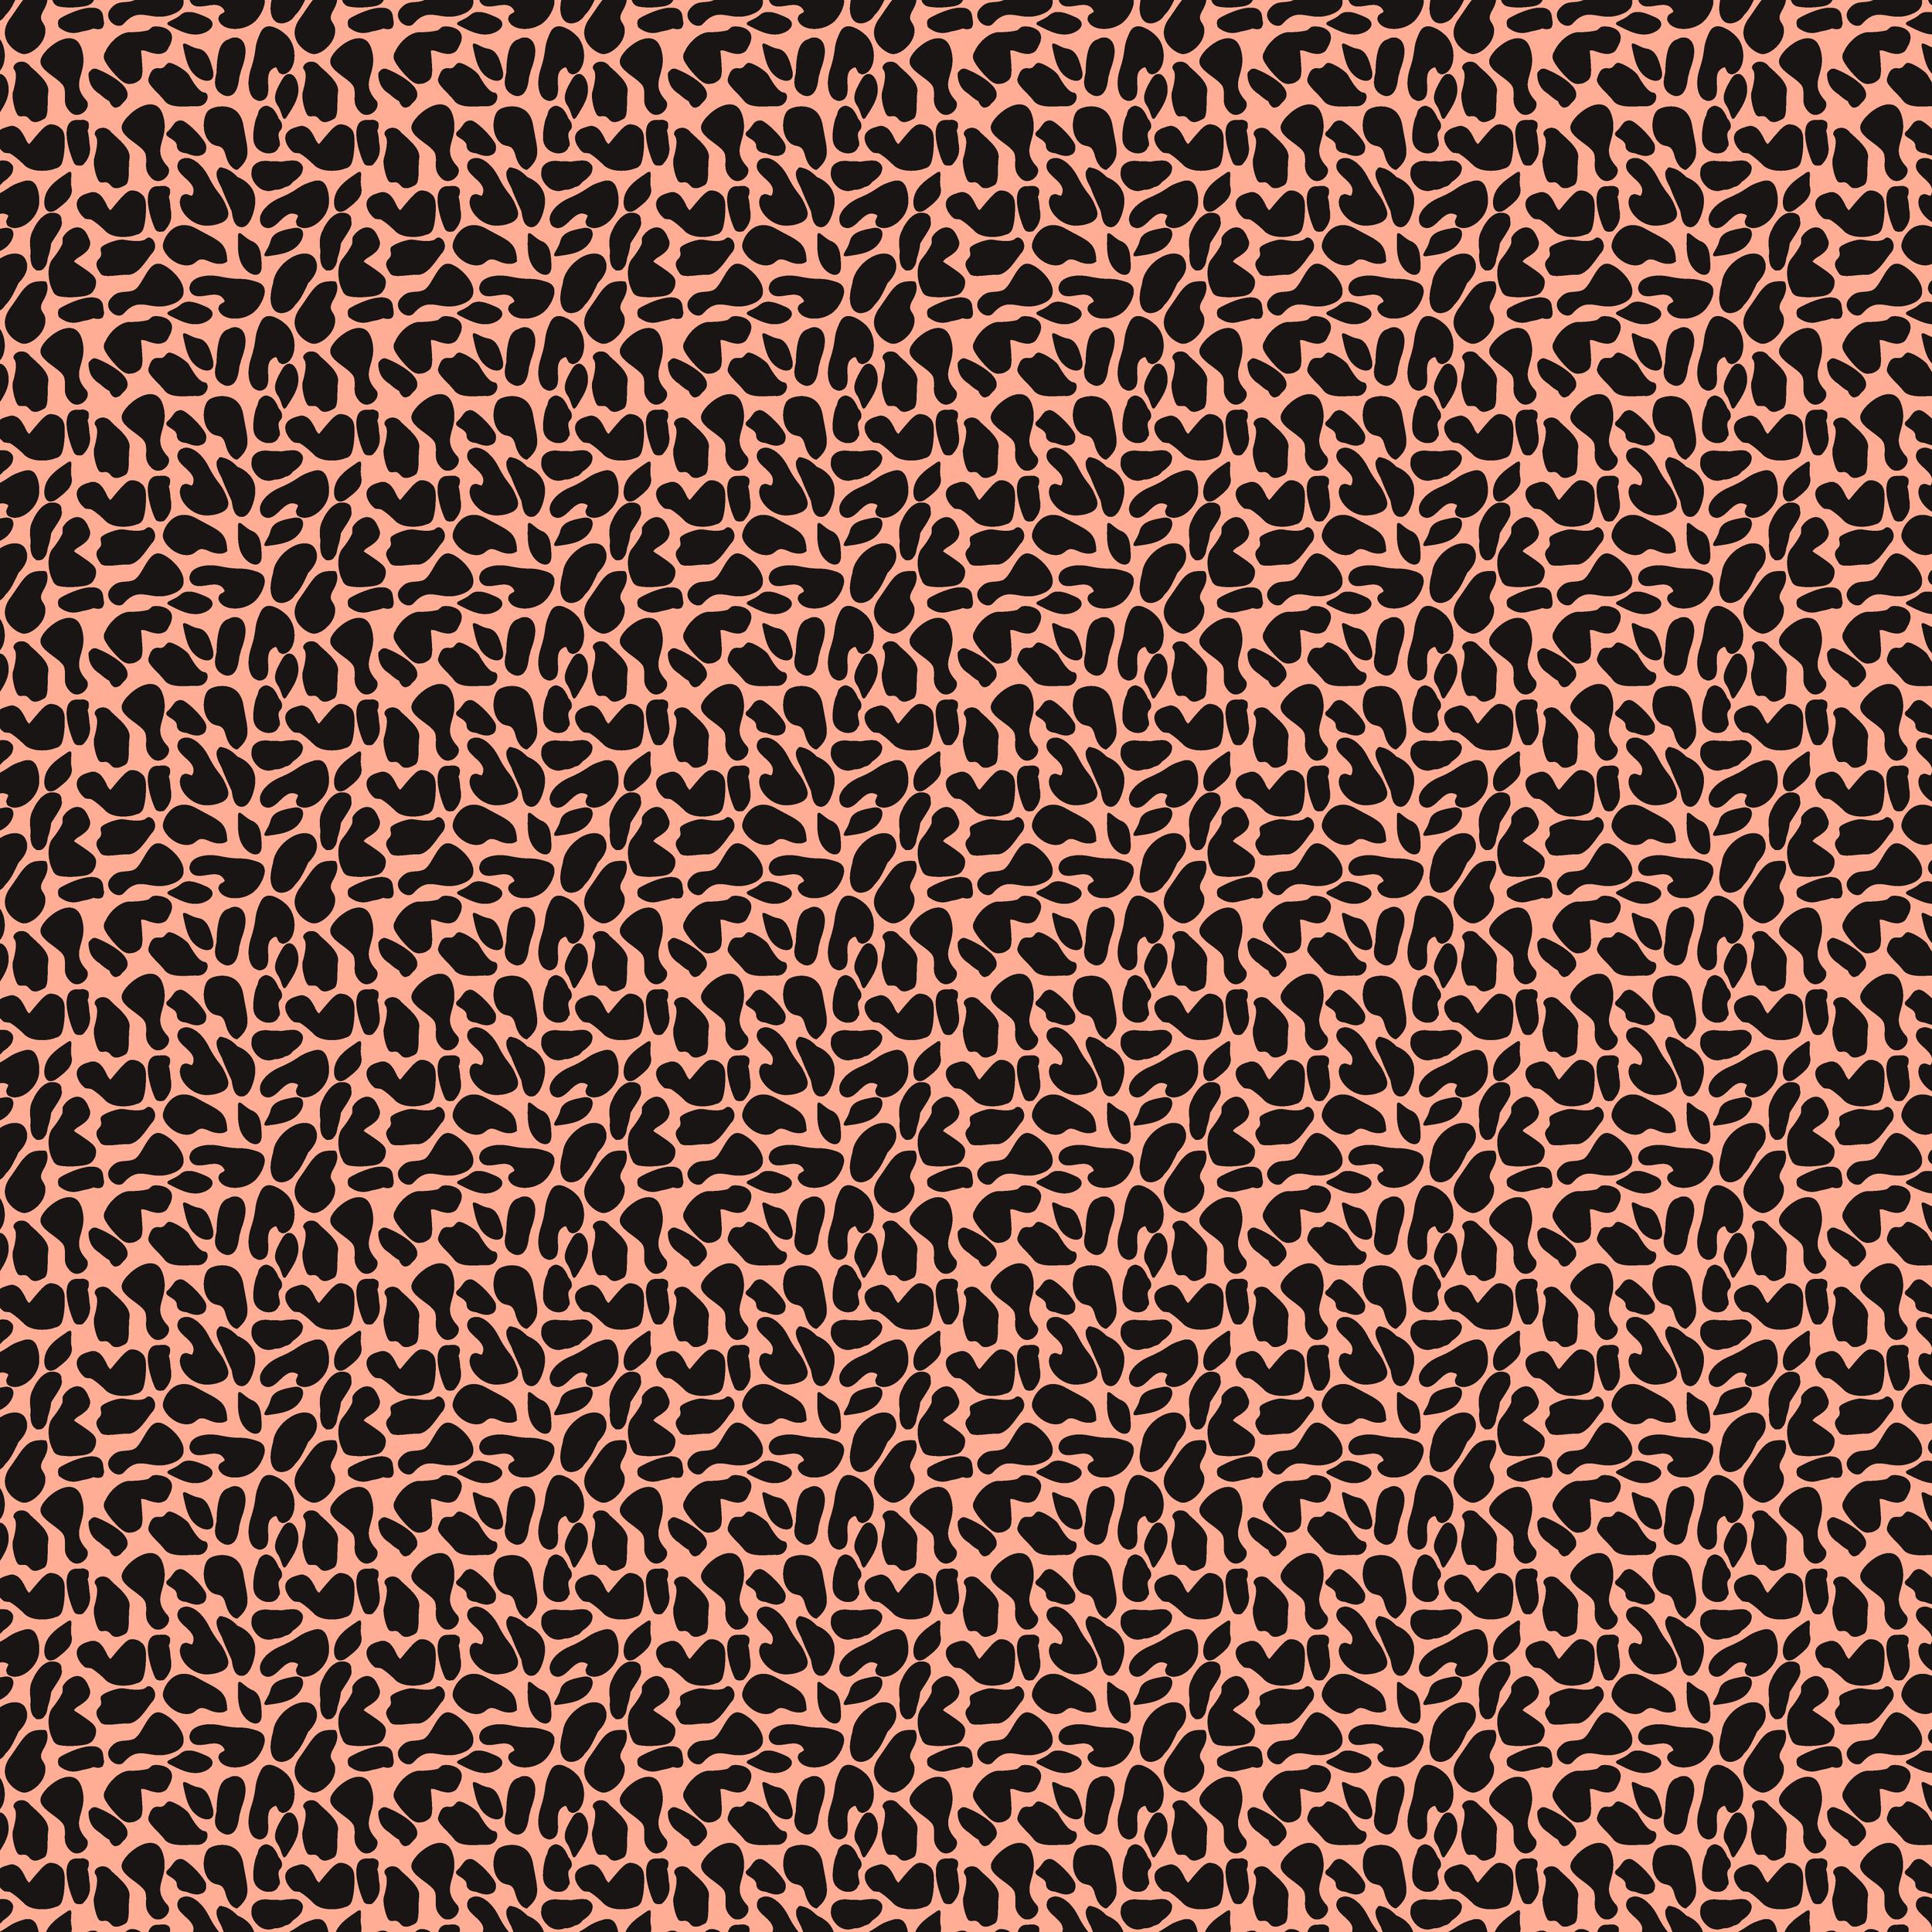 Leopard Patterns_Light Peach_300 dpi.png